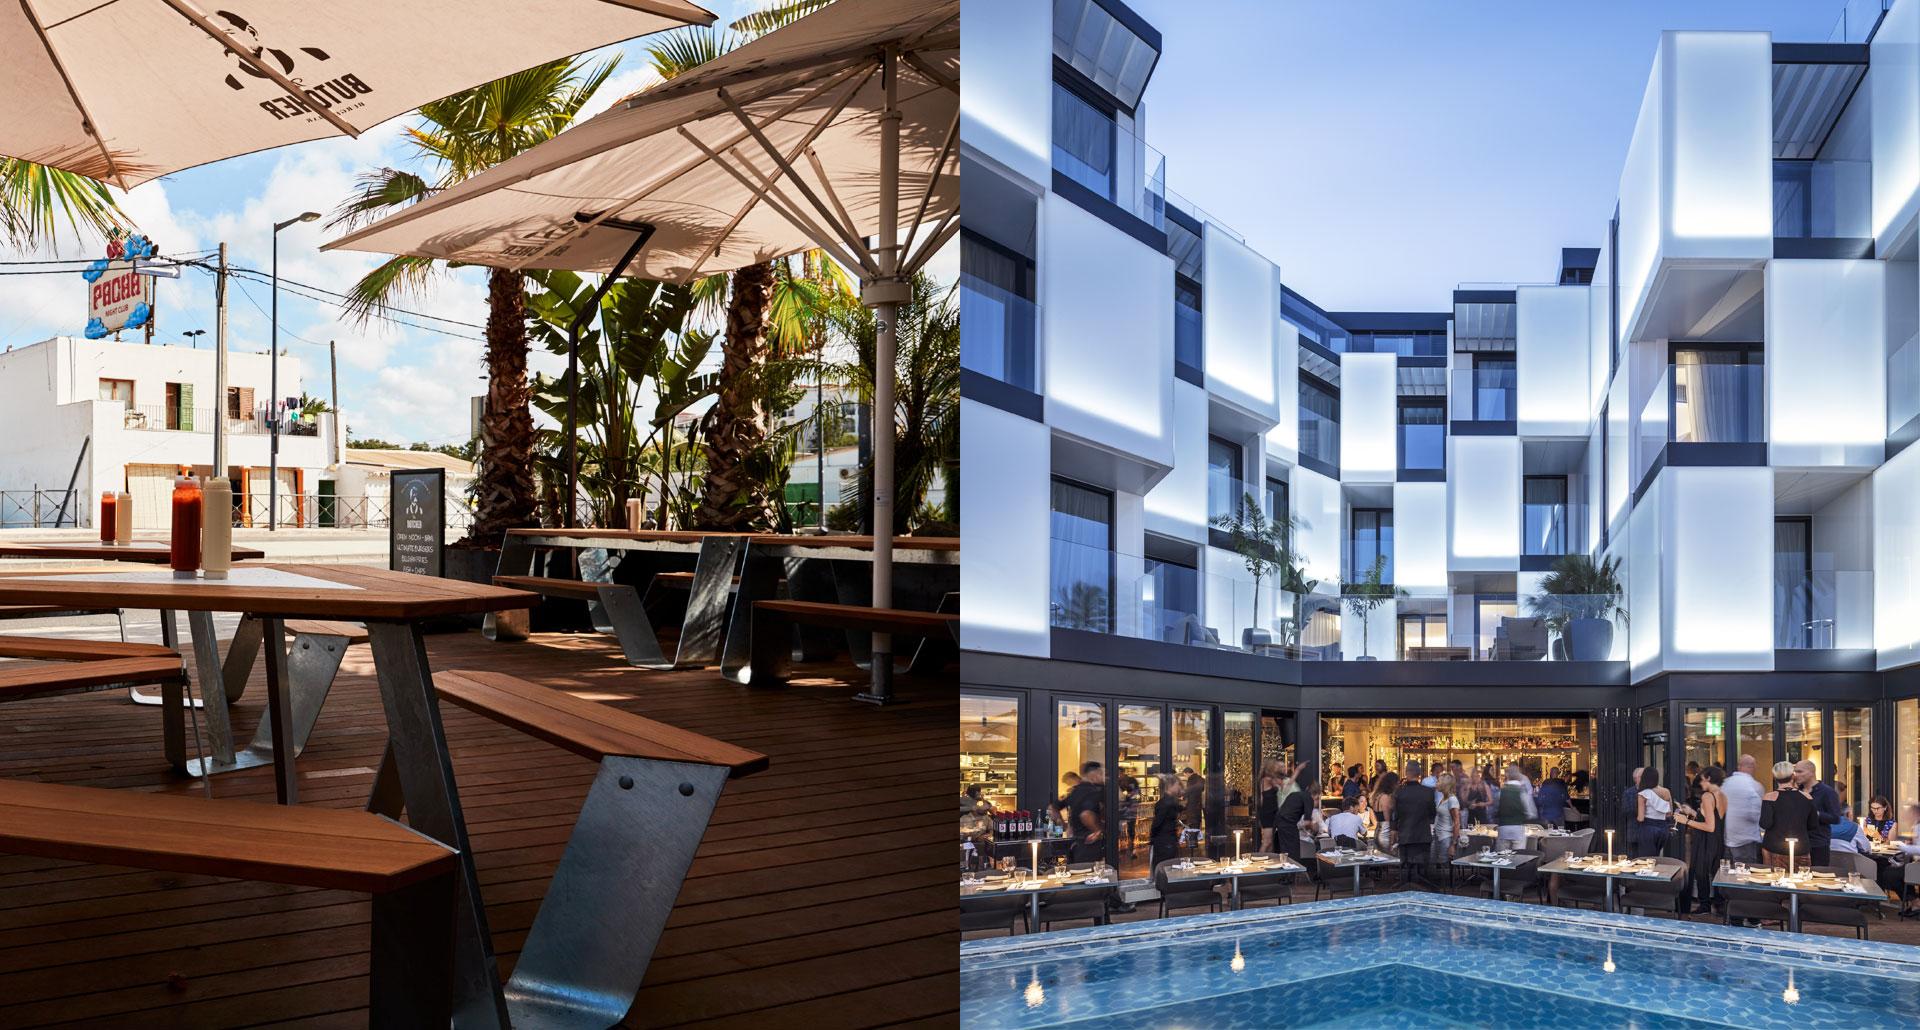 Sir Joan Hotel - best nightlife boutique hotel in Miami Beach, Florida